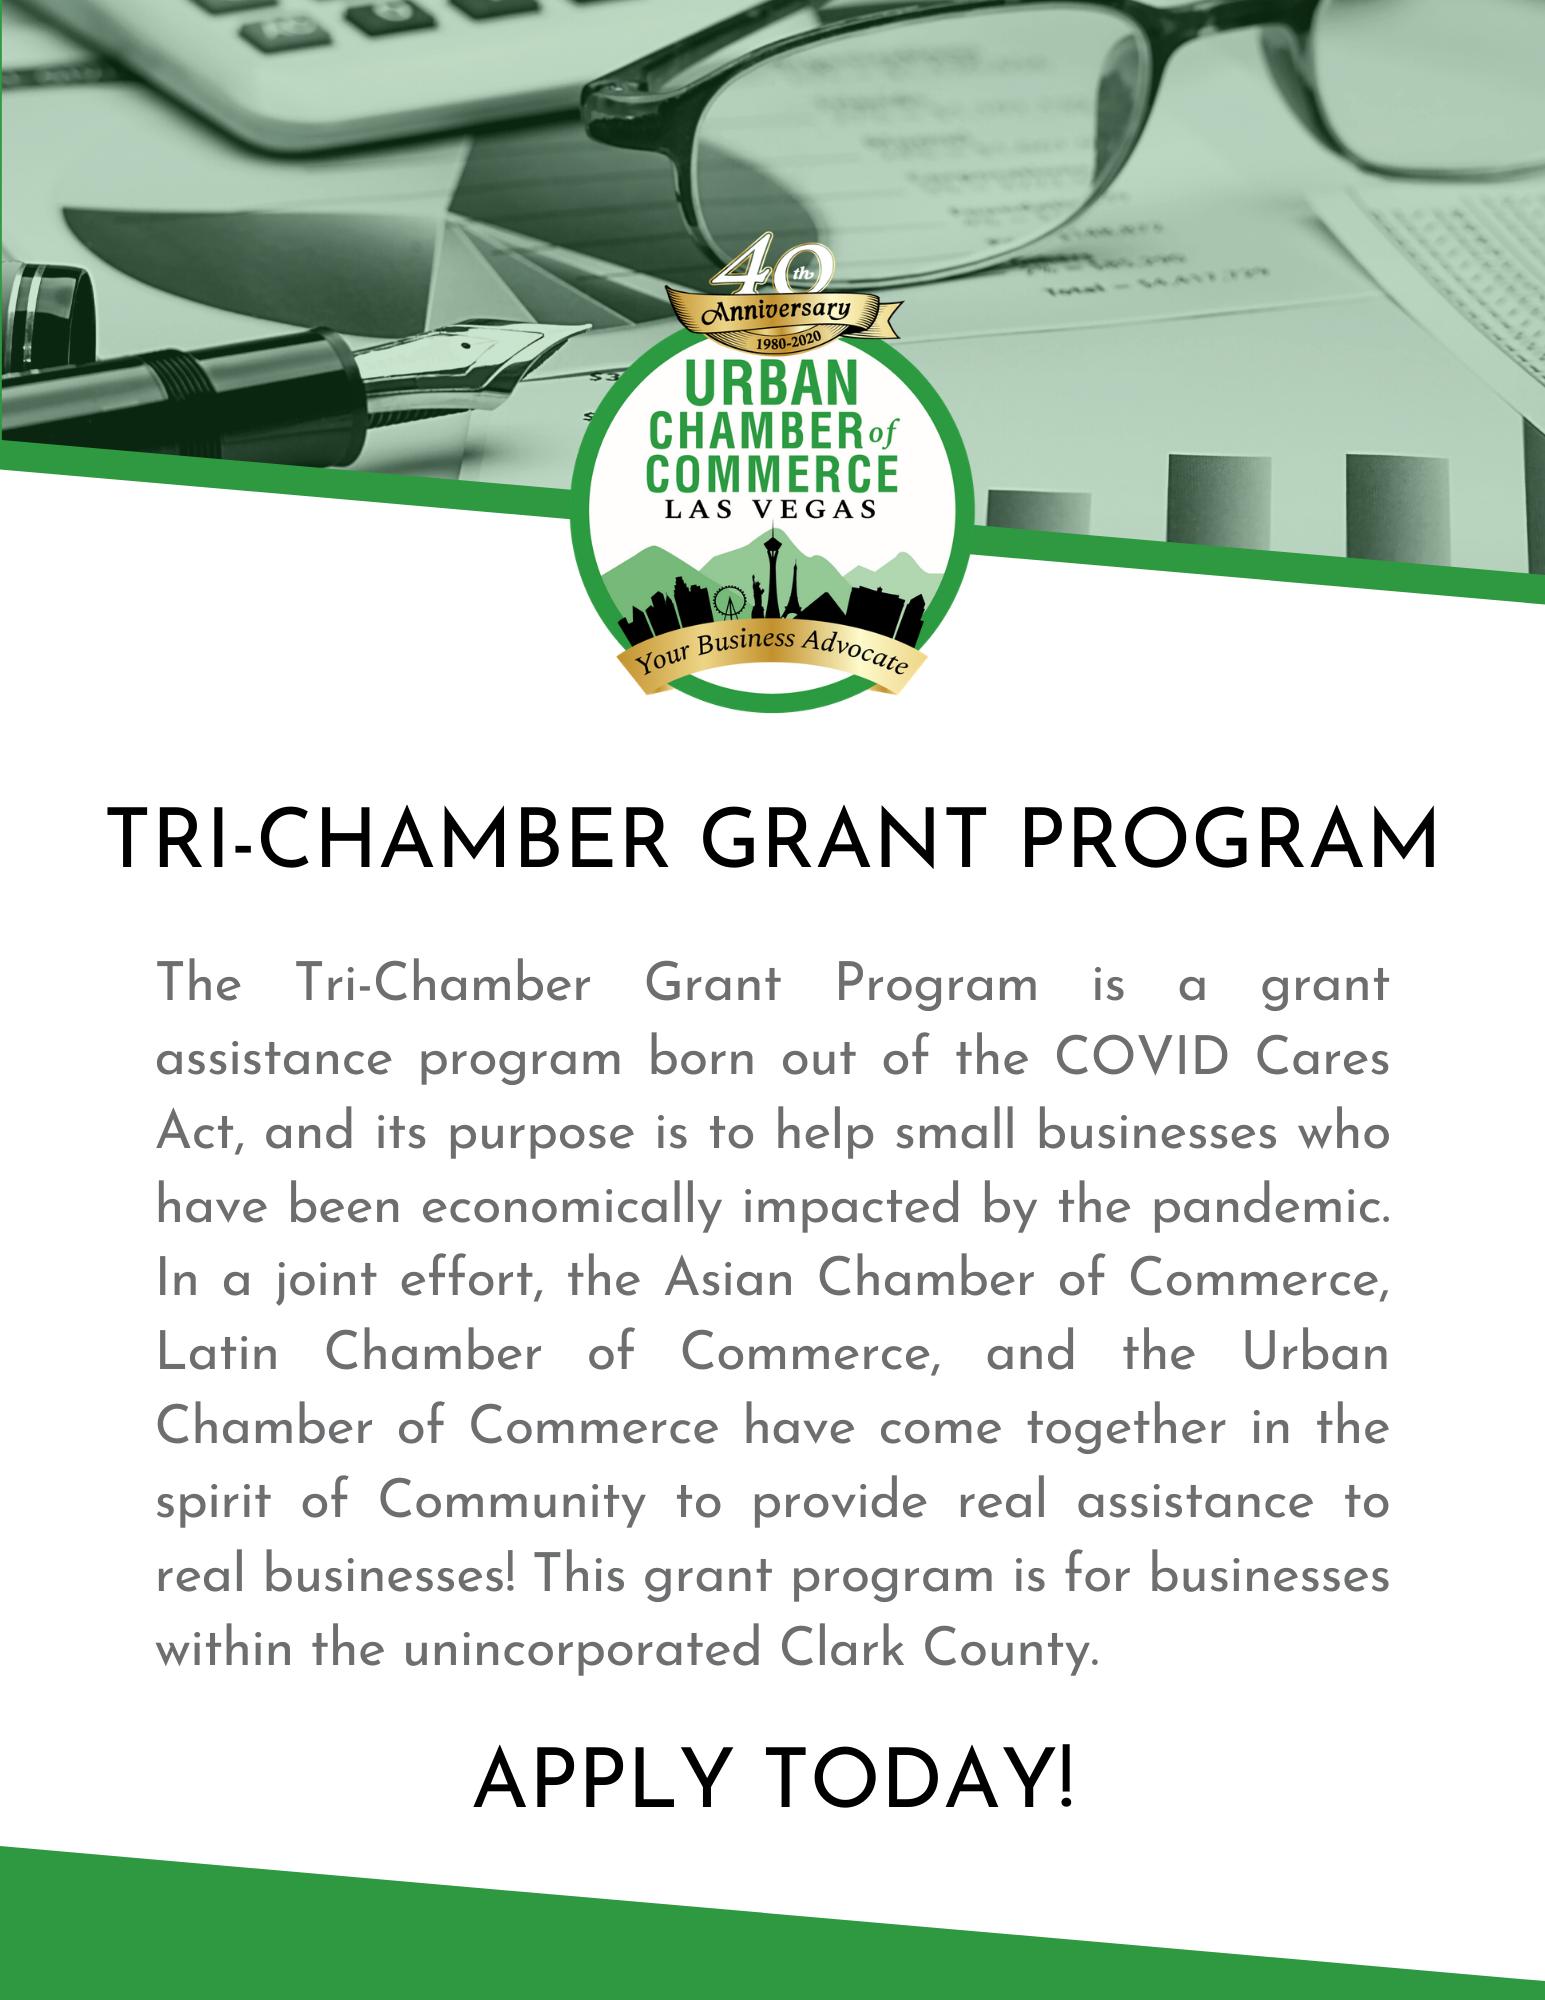 Tri-Chamber Grant Program